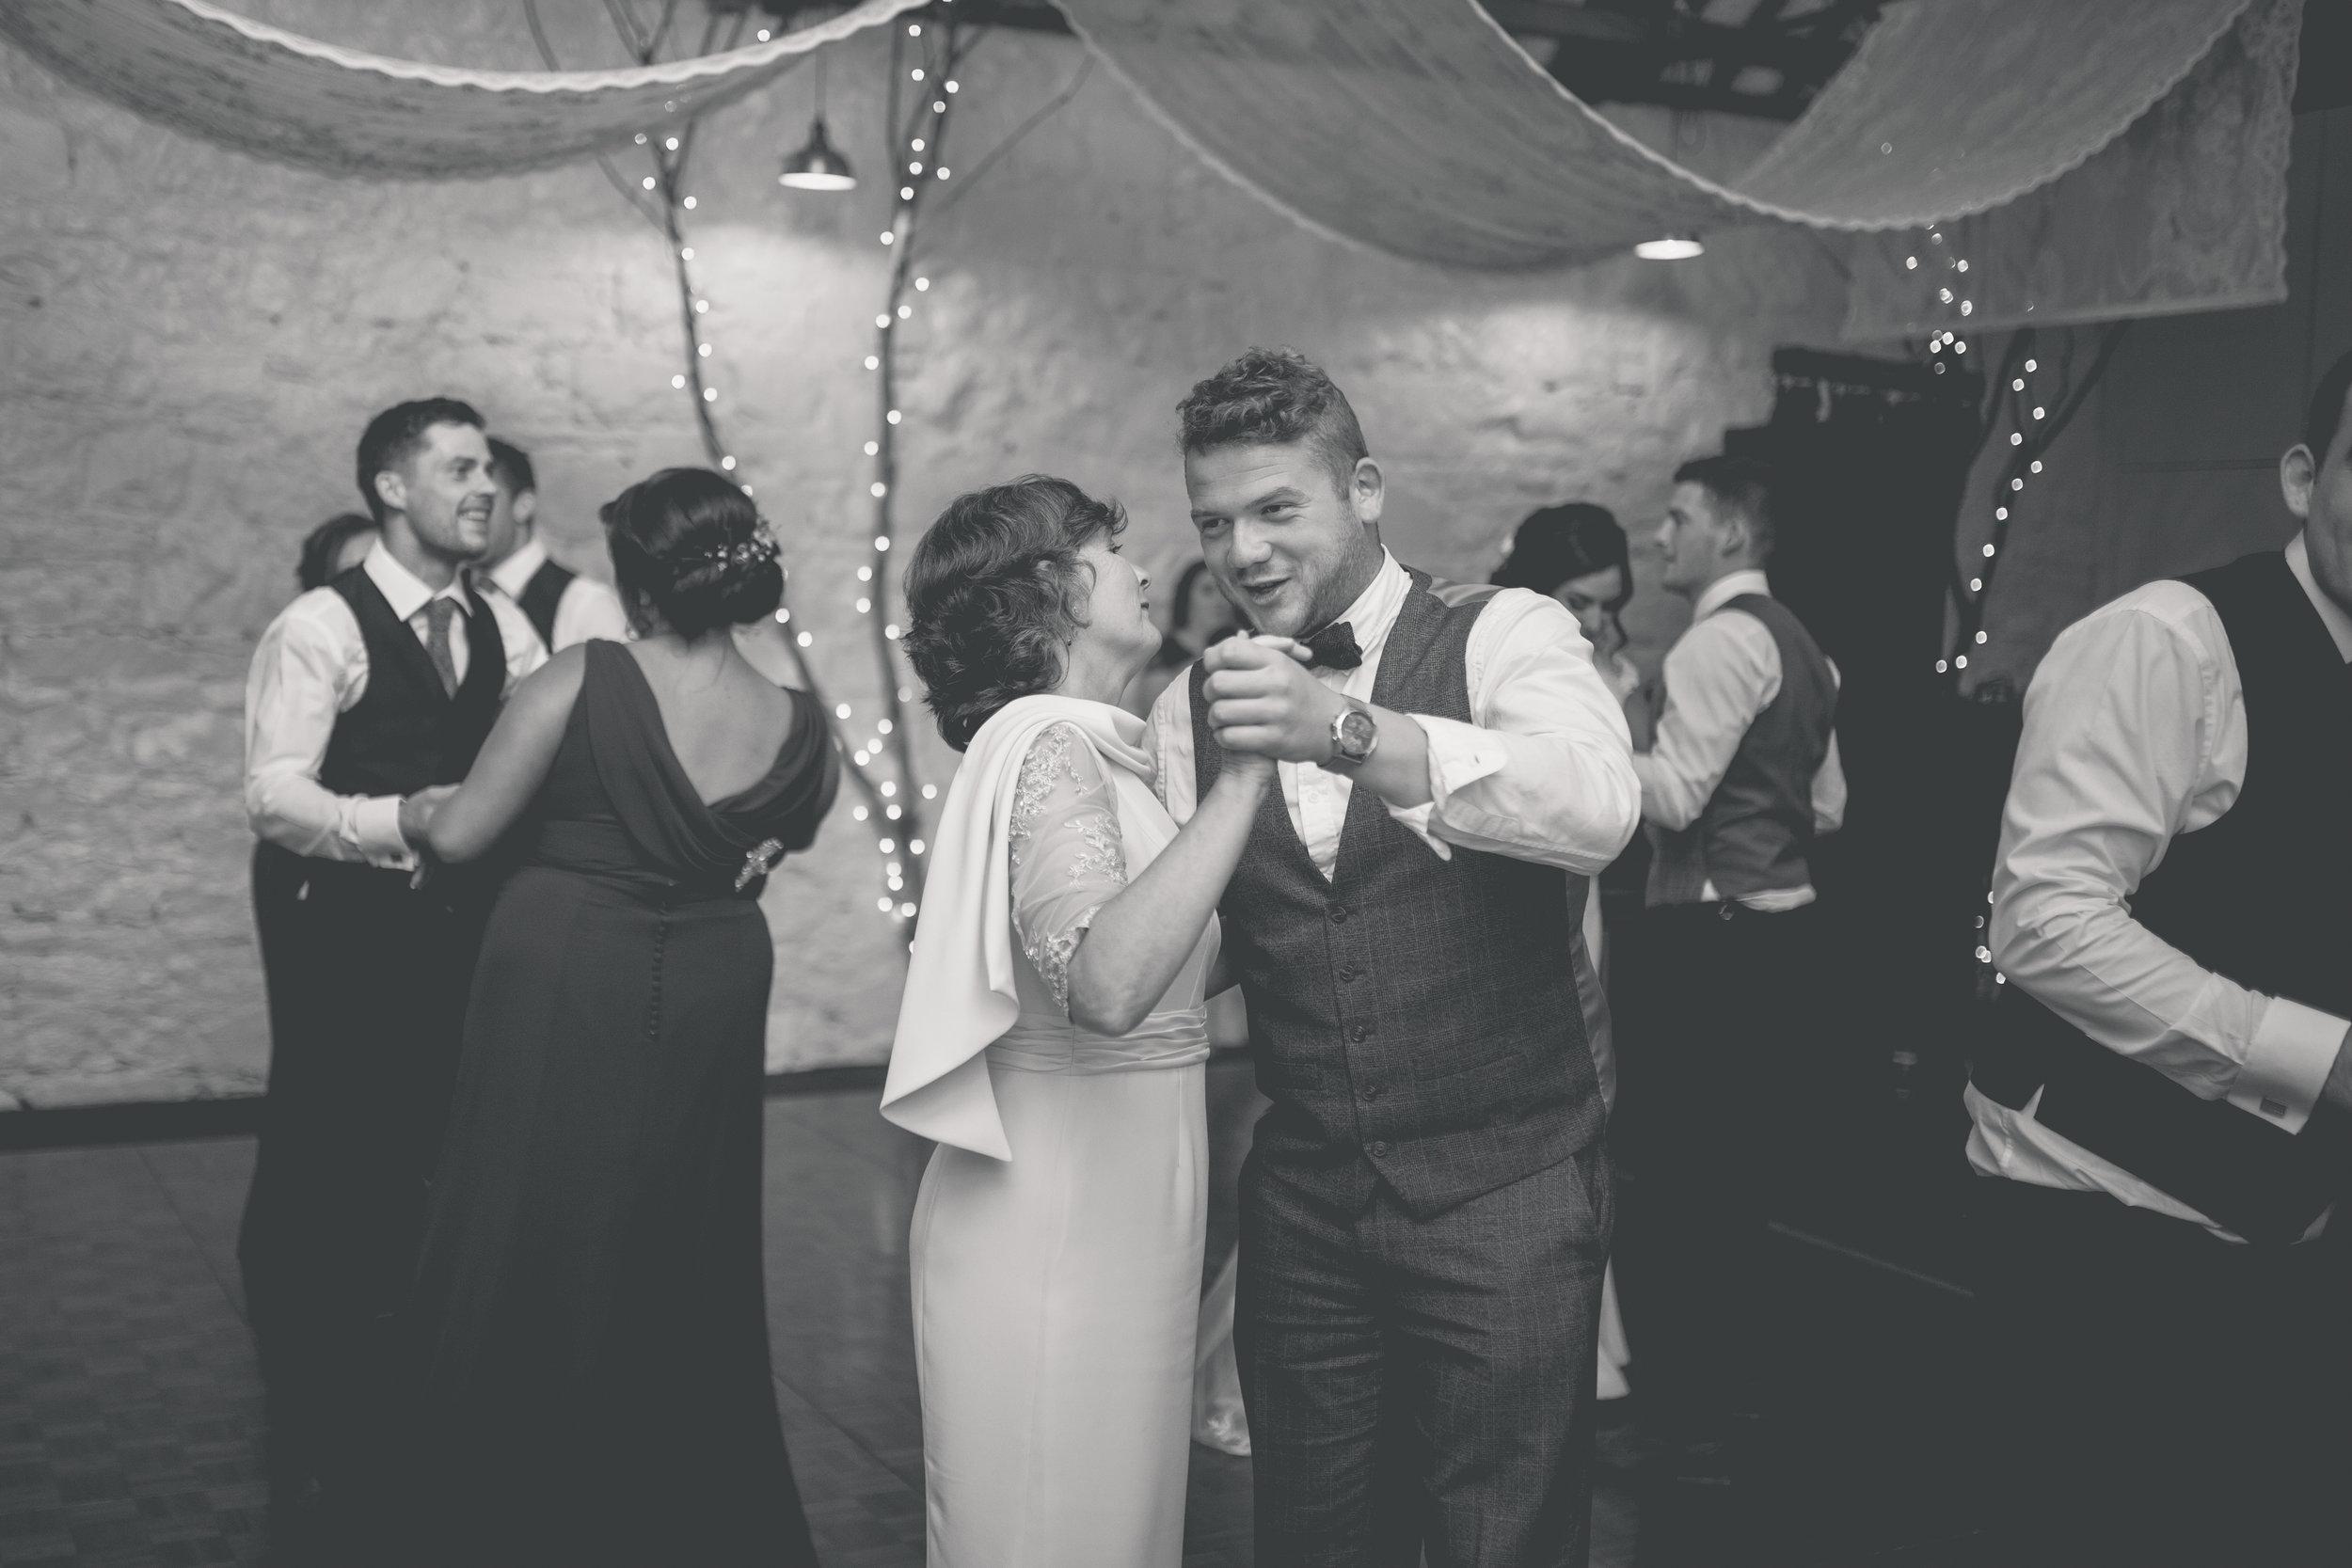 Brian McEwan Wedding Photography | Carol-Annee & Sean | The Dancing-39.jpg